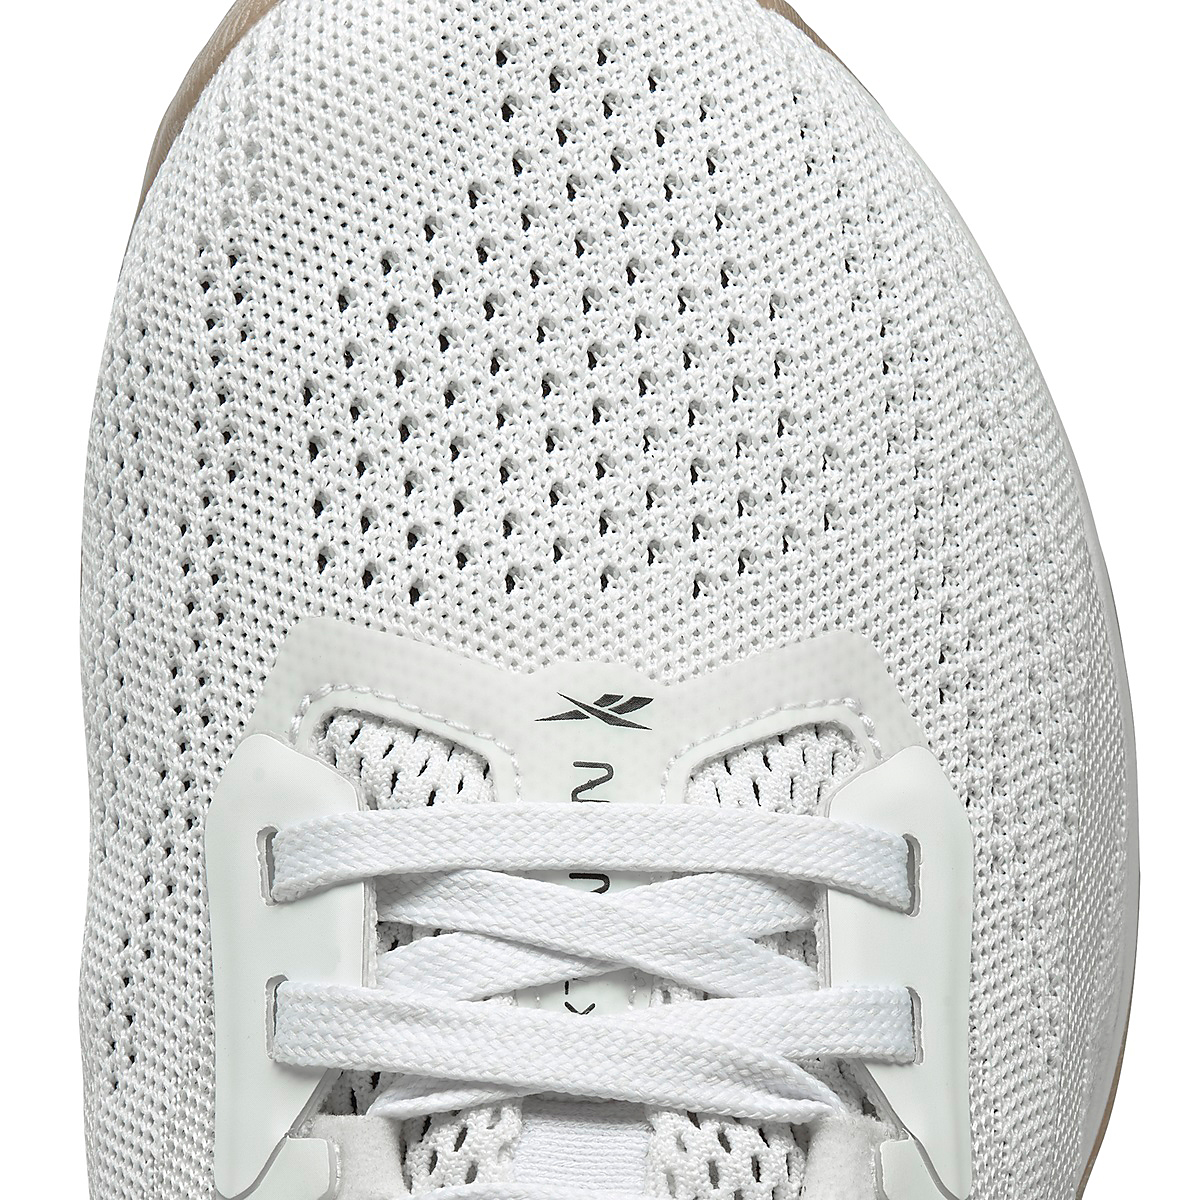 Men's Reebok Nano X1 Training Shoe - Color: White/Black/Reebok Rubber Gum - Size: 6 - Width: Regular, White/Black/Reebok Rubber Gum, large, image 4